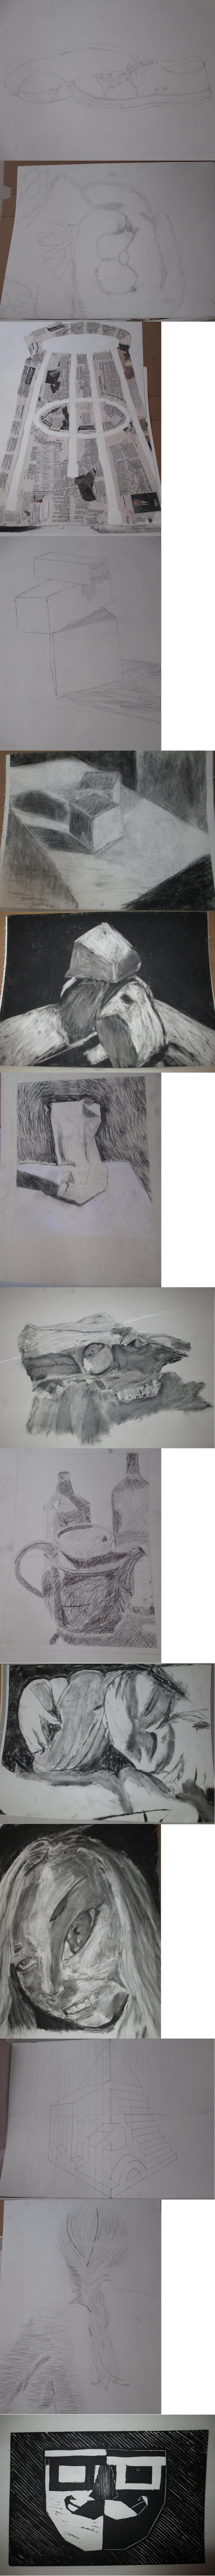 Art Class 2013 by Heyro0